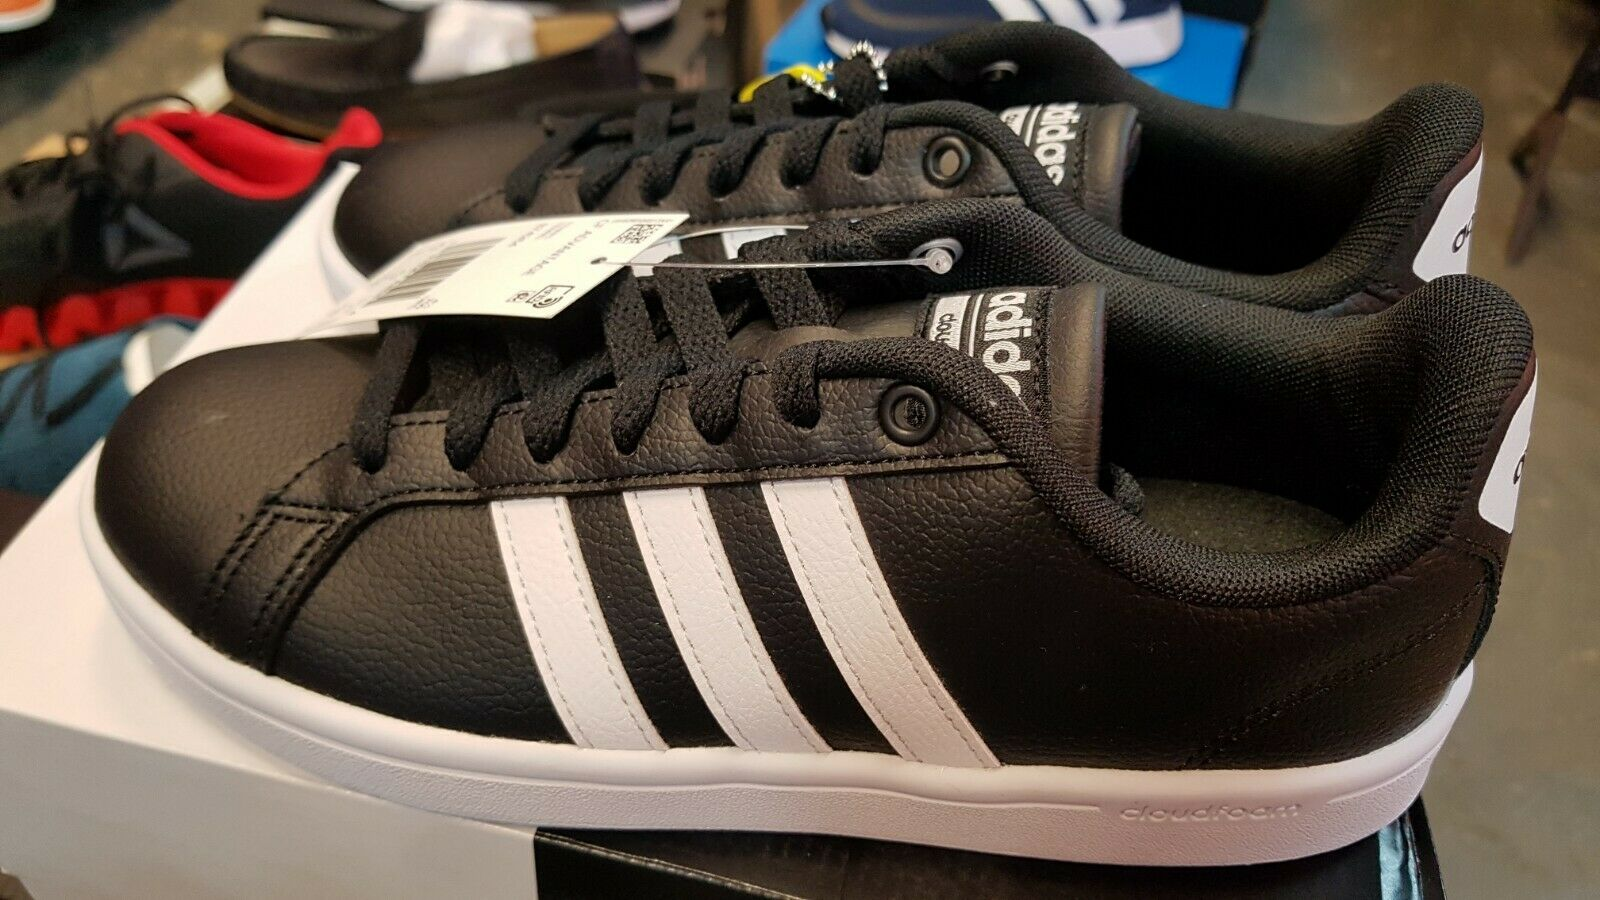 buy popular 675f8 a6ced Adidas CF ADVANTAGE SNEAKER - MEN S, Size 5.5 US, New